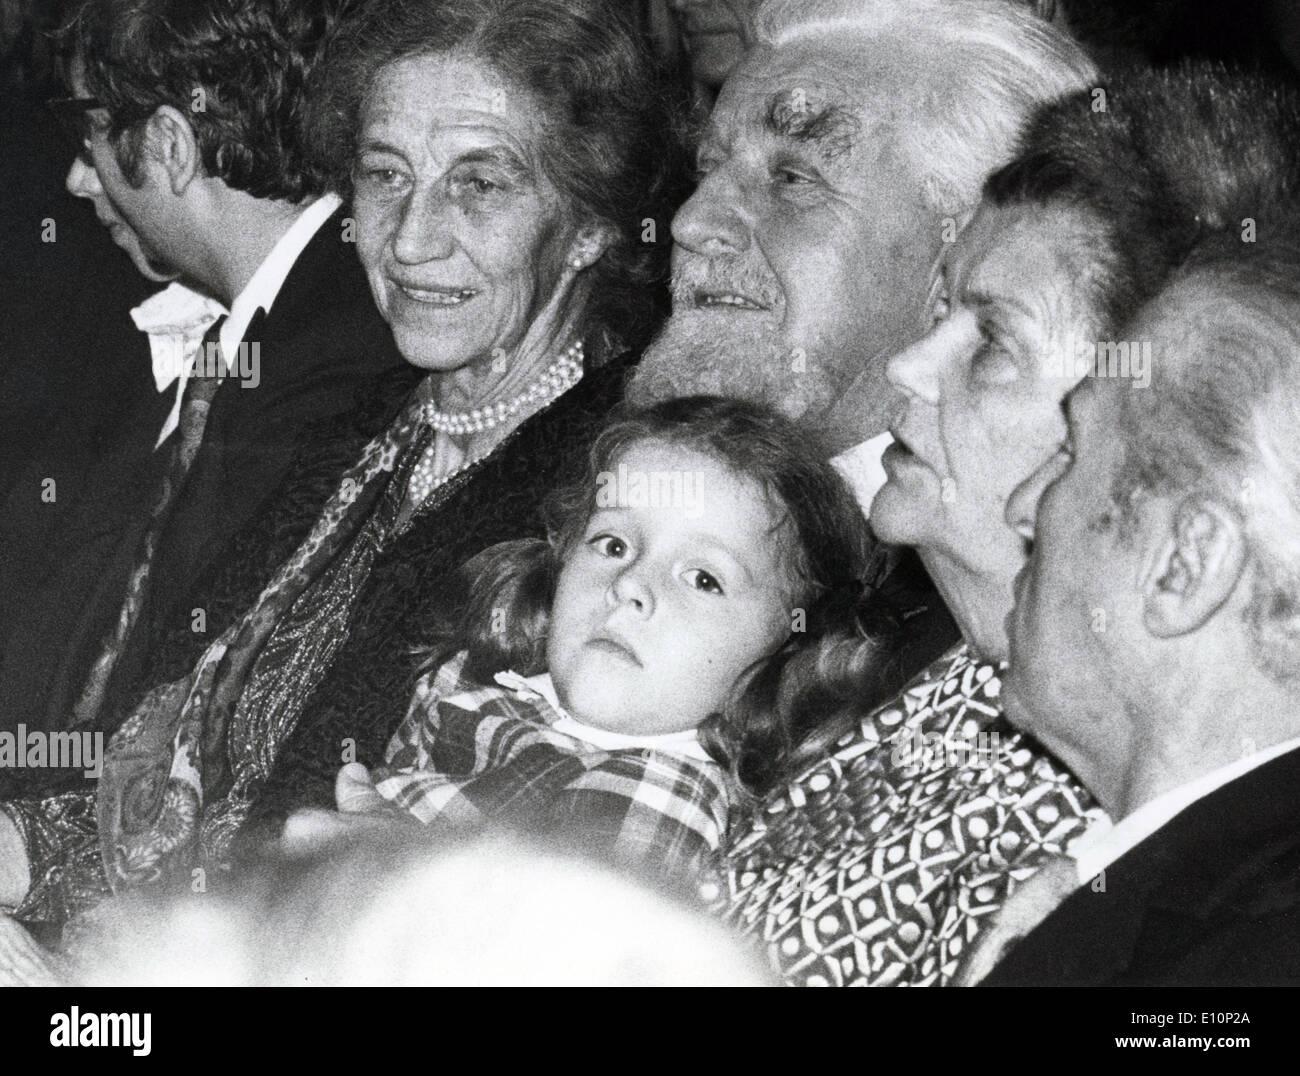 Nov. 5, 1973 - Zurich, Switzerland - Behaviorist KONRAD LORENZ sitting with his wife and family at his 70th birthday celebration. On the right is German writer CARL ZUCKMAYER. - Stock Image